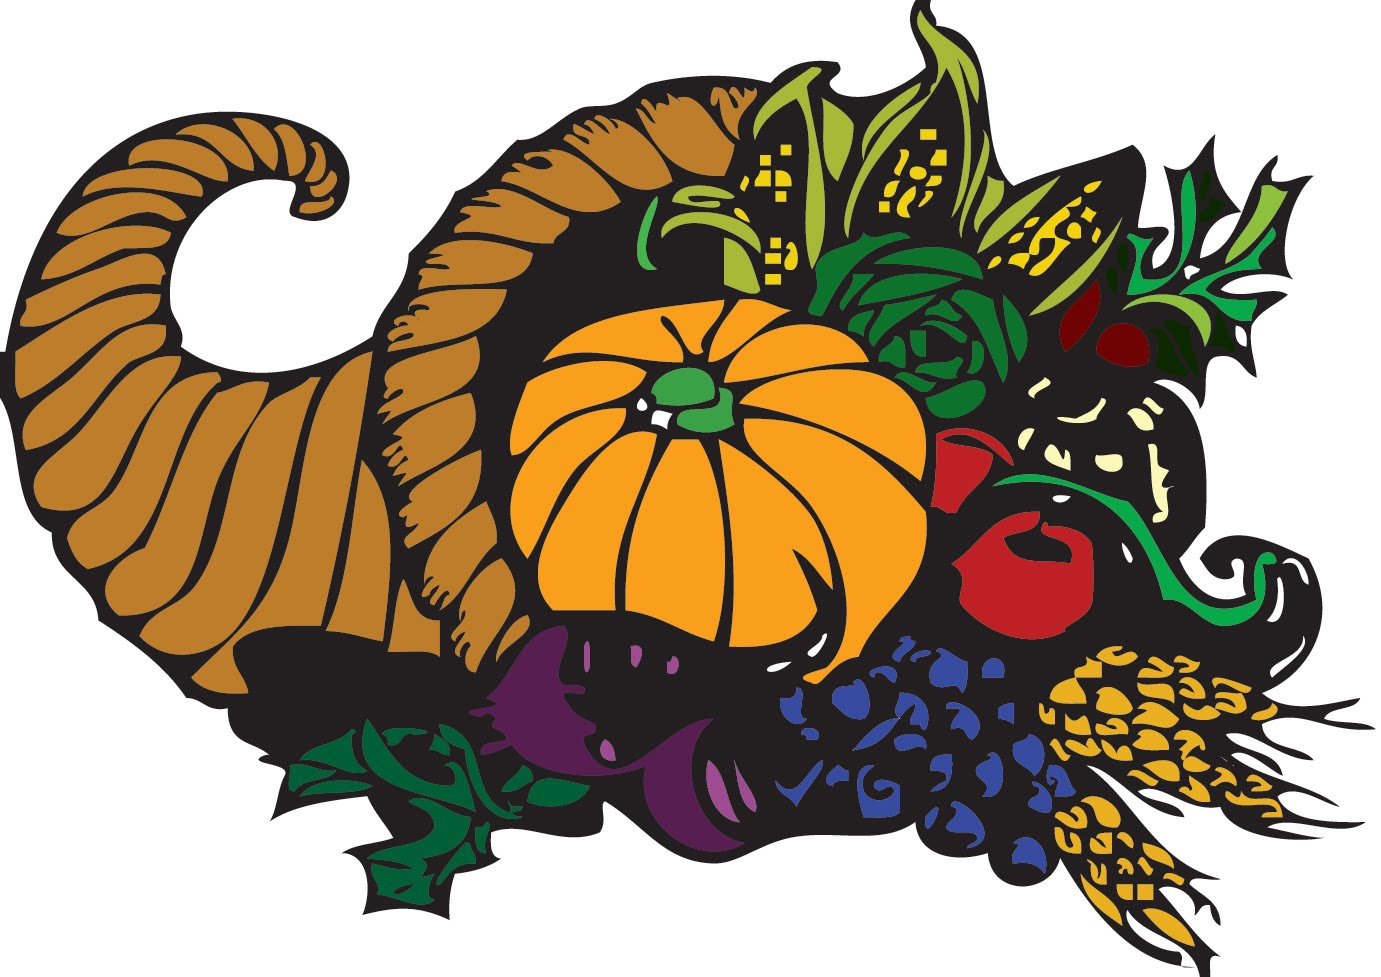 Pix For u0026gt; First Thanksgiving .-Pix For u0026gt; First Thanksgiving .-13